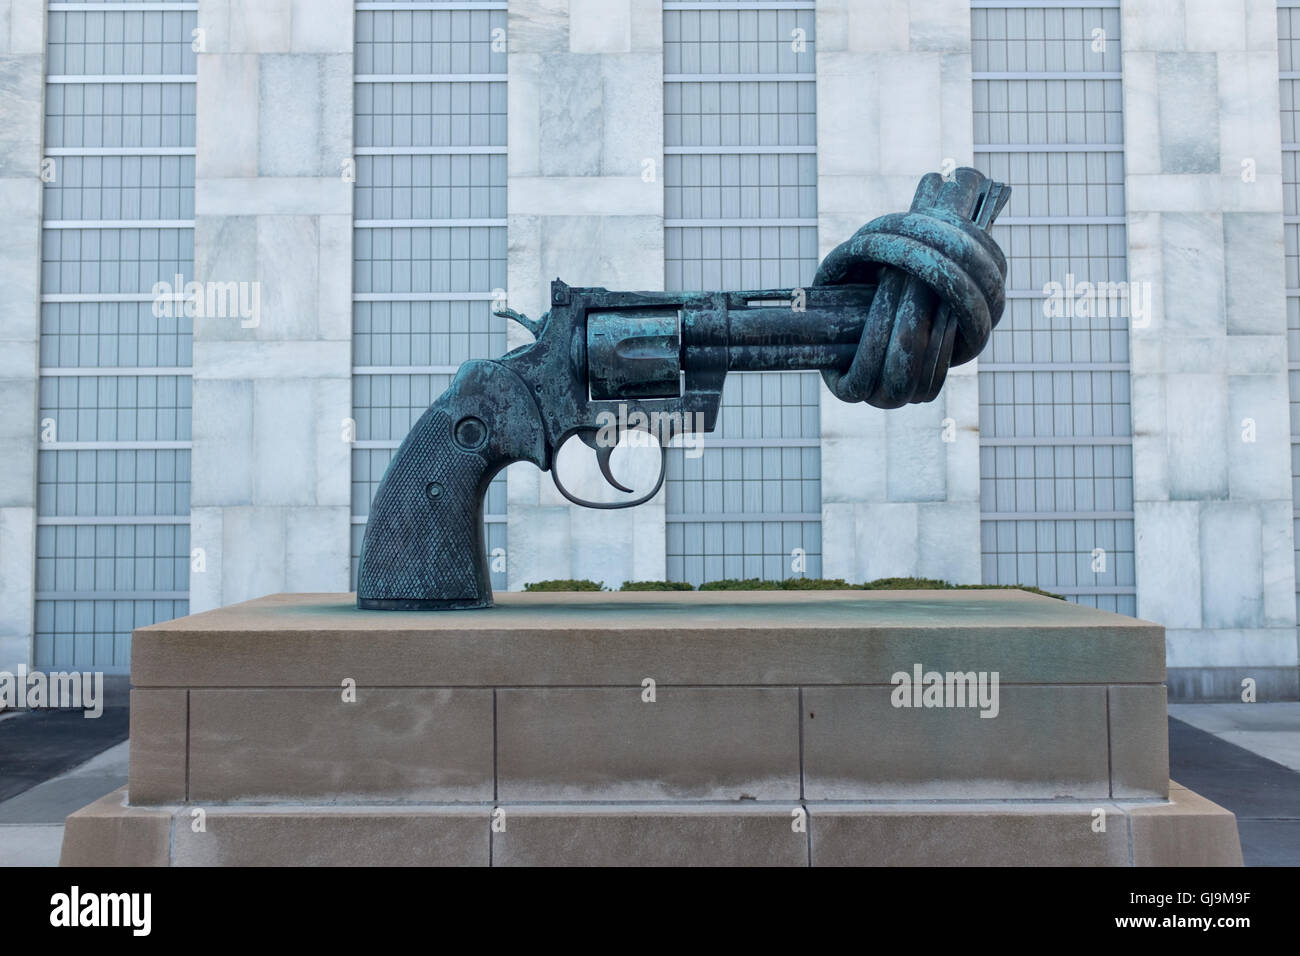 New York City USA United Nations Building. Non-Violence sculpture by Swedish artist Carl Fredrik Reuterswärd. - Stock Image